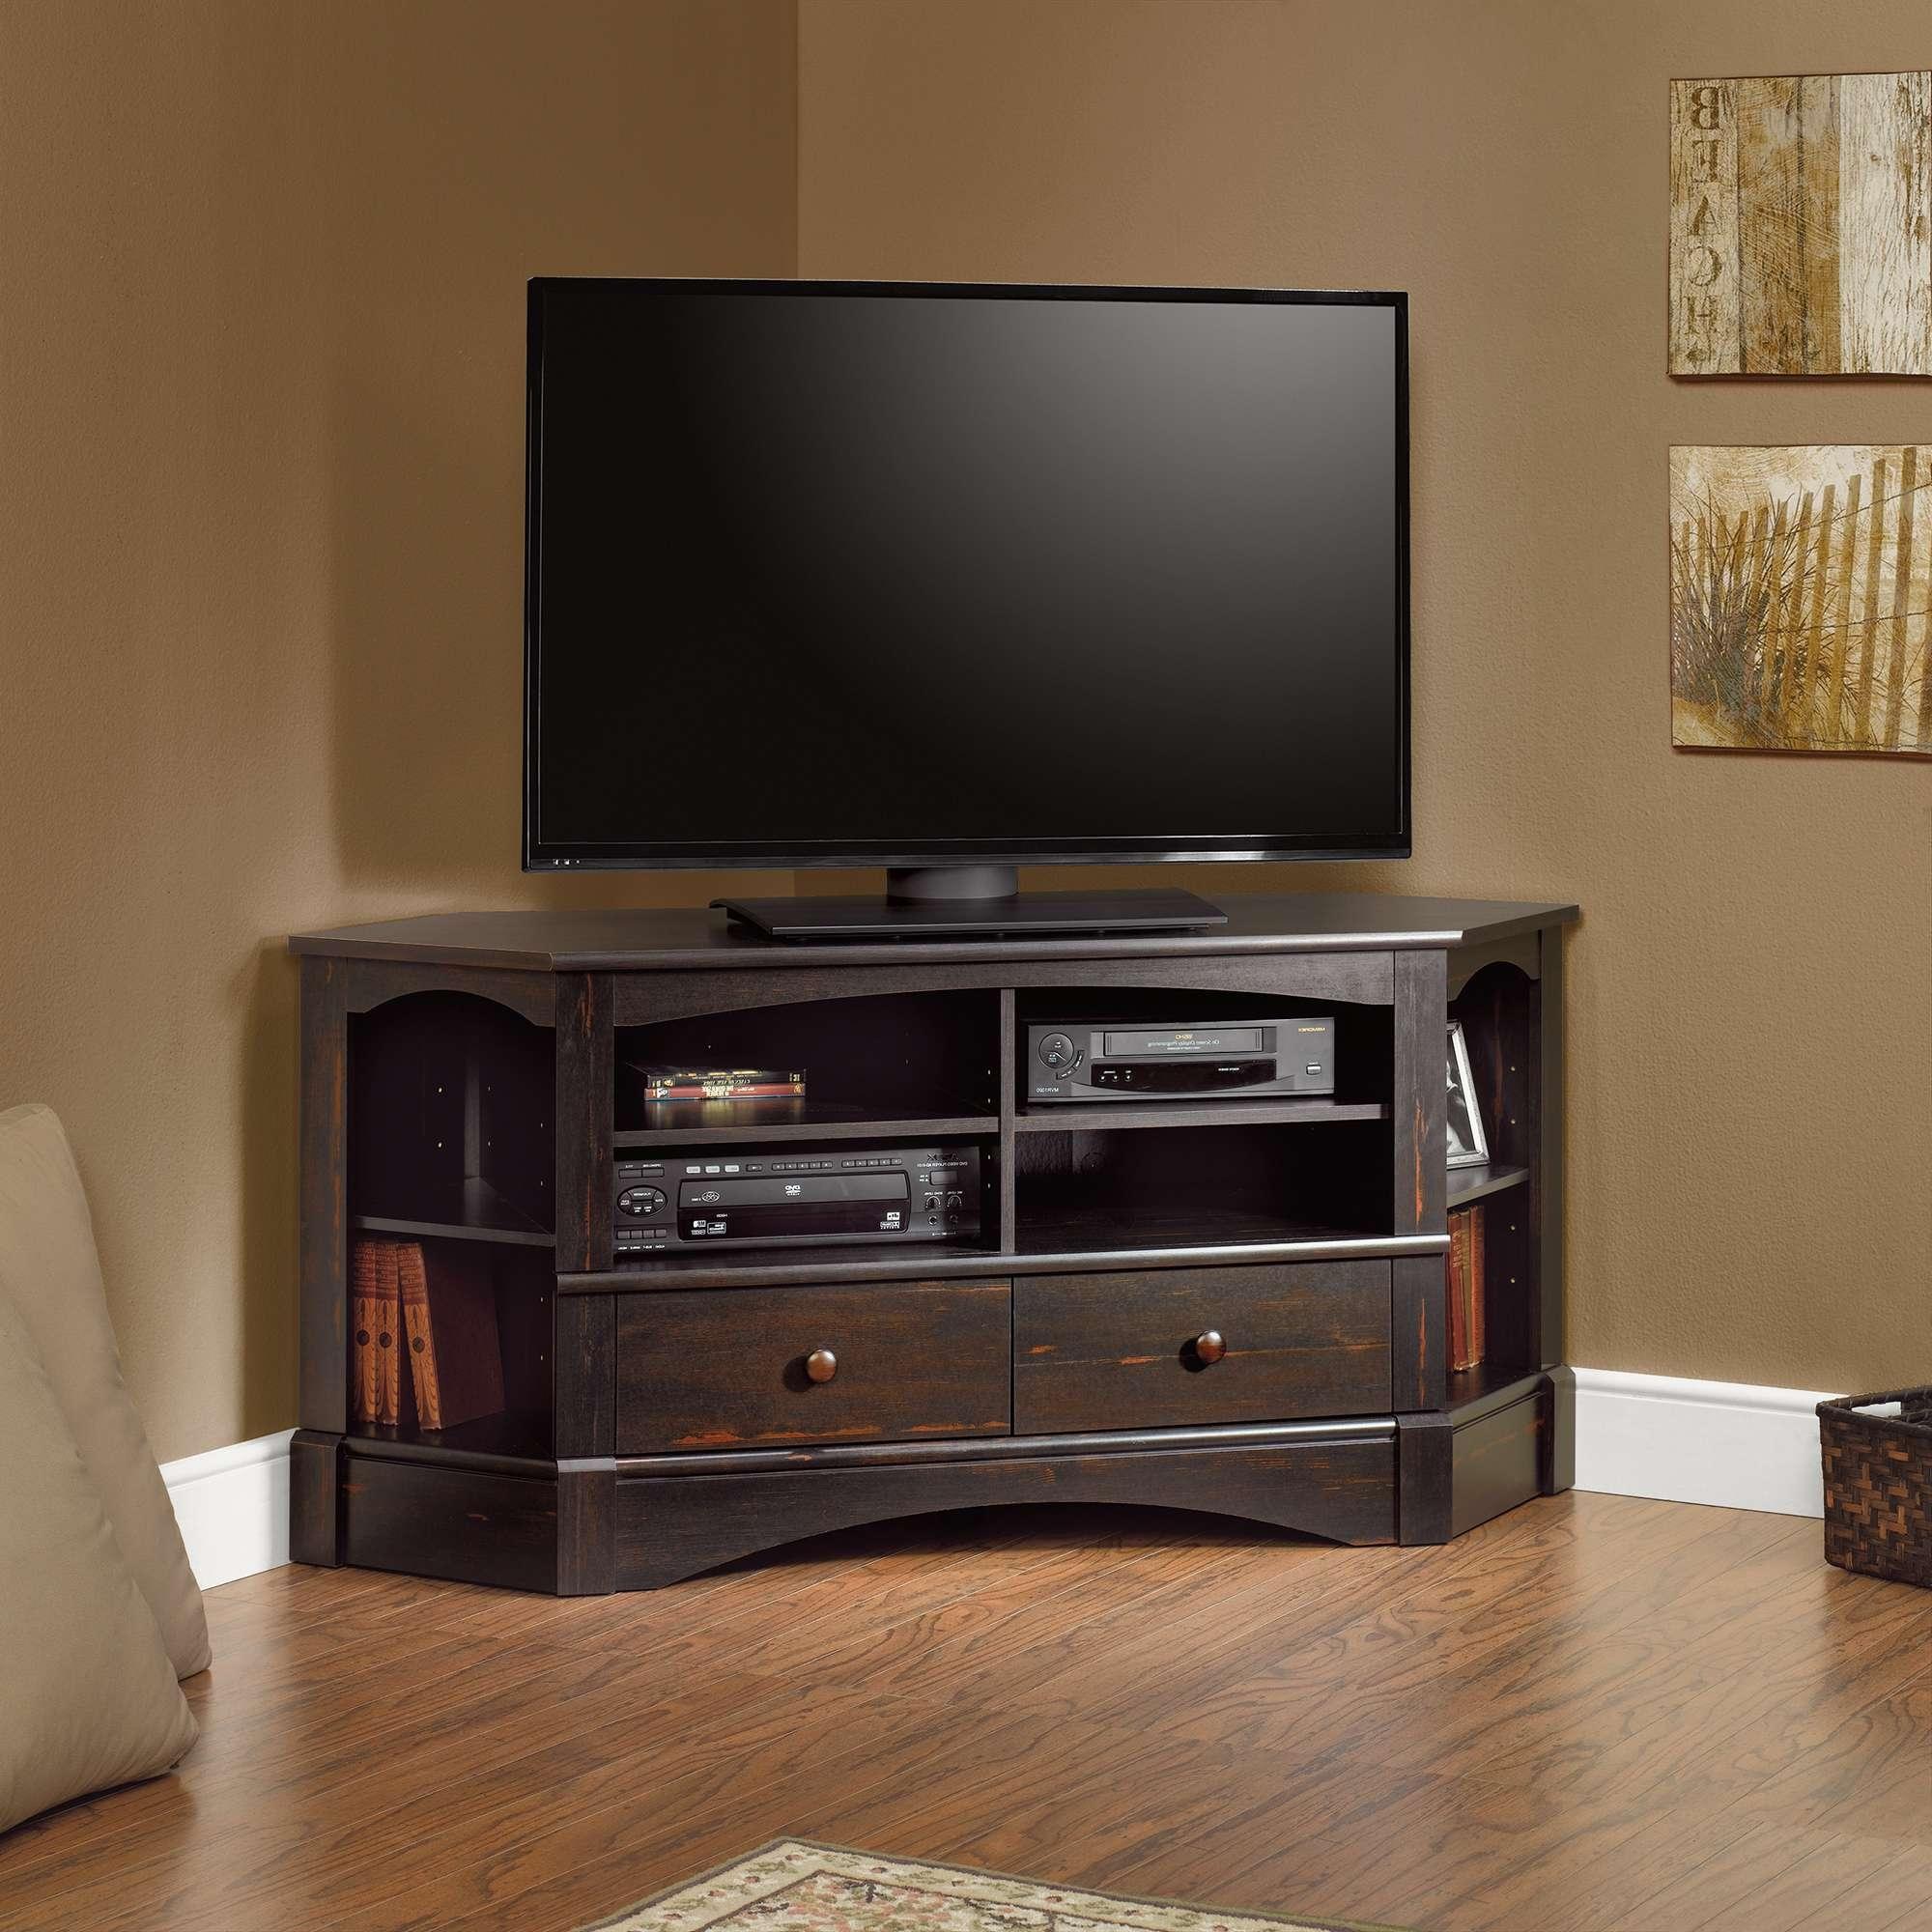 Tv : Imposing Corner Tv Cabinet Cherry Wood Exquisite Oak Corner In Cherry Wood Tv Cabinets (View 9 of 20)